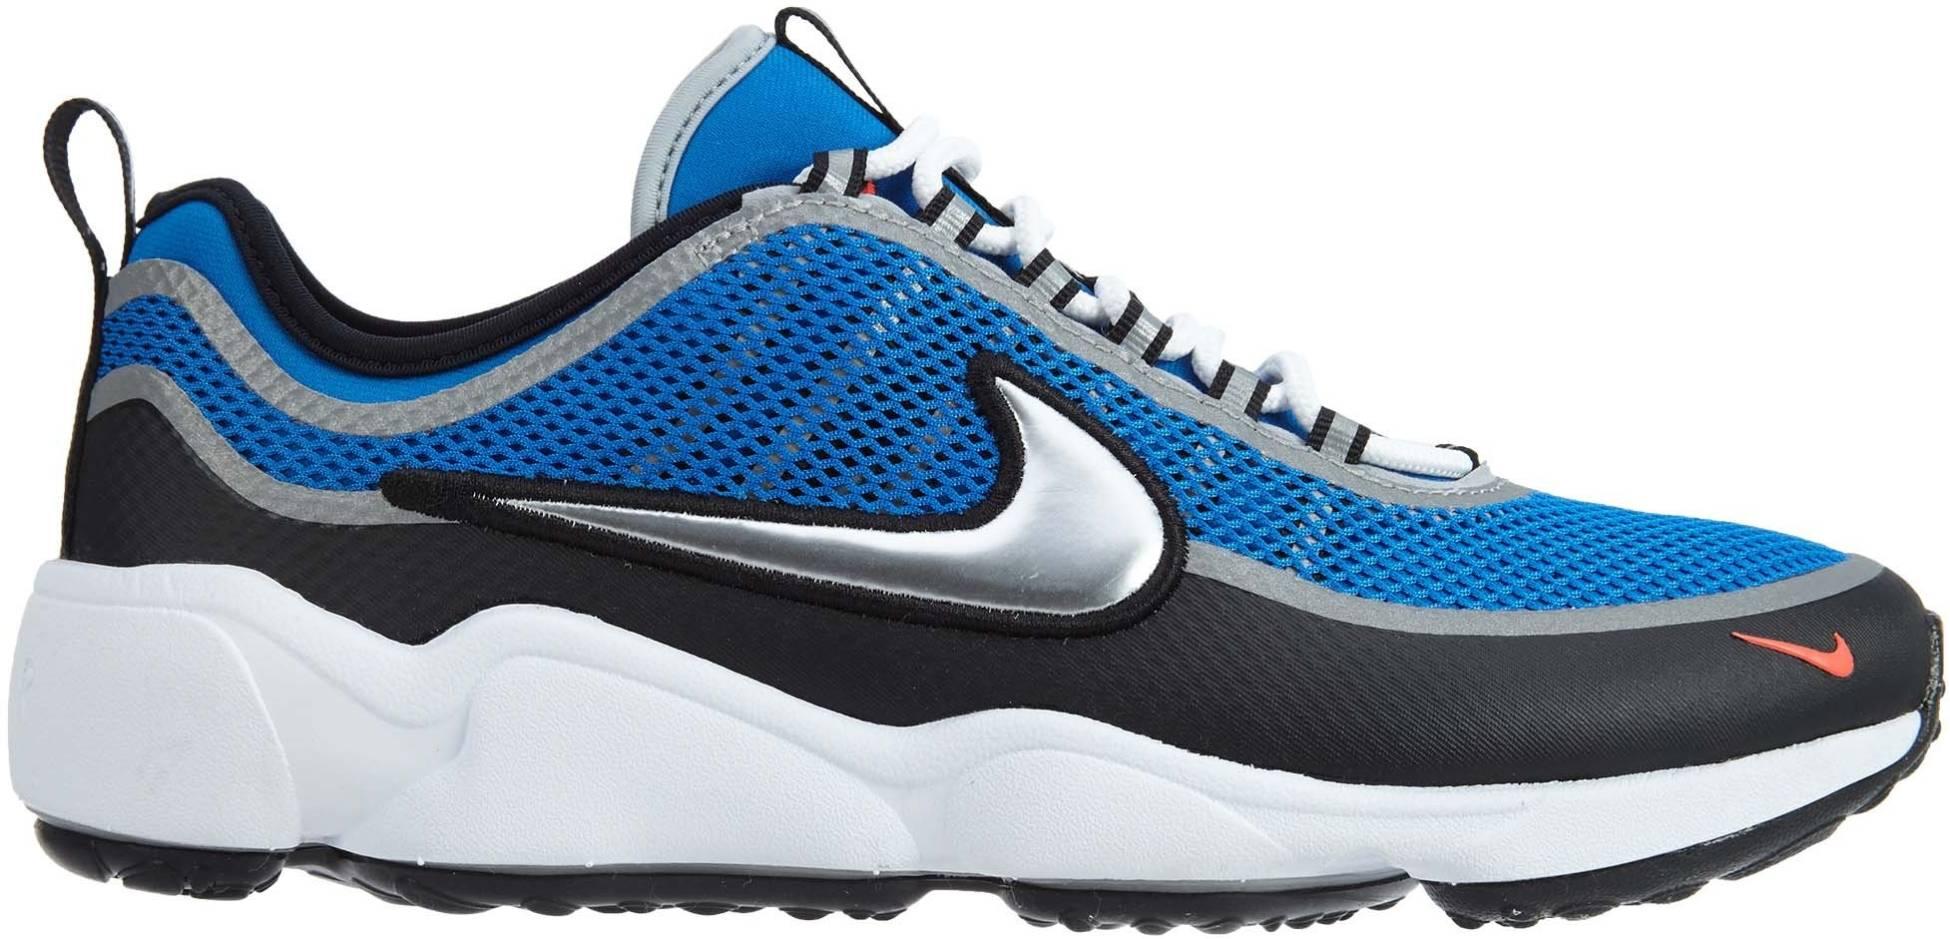 Nike Air Zoom Spiridon sneakers in blue (only $150) | RunRepeat